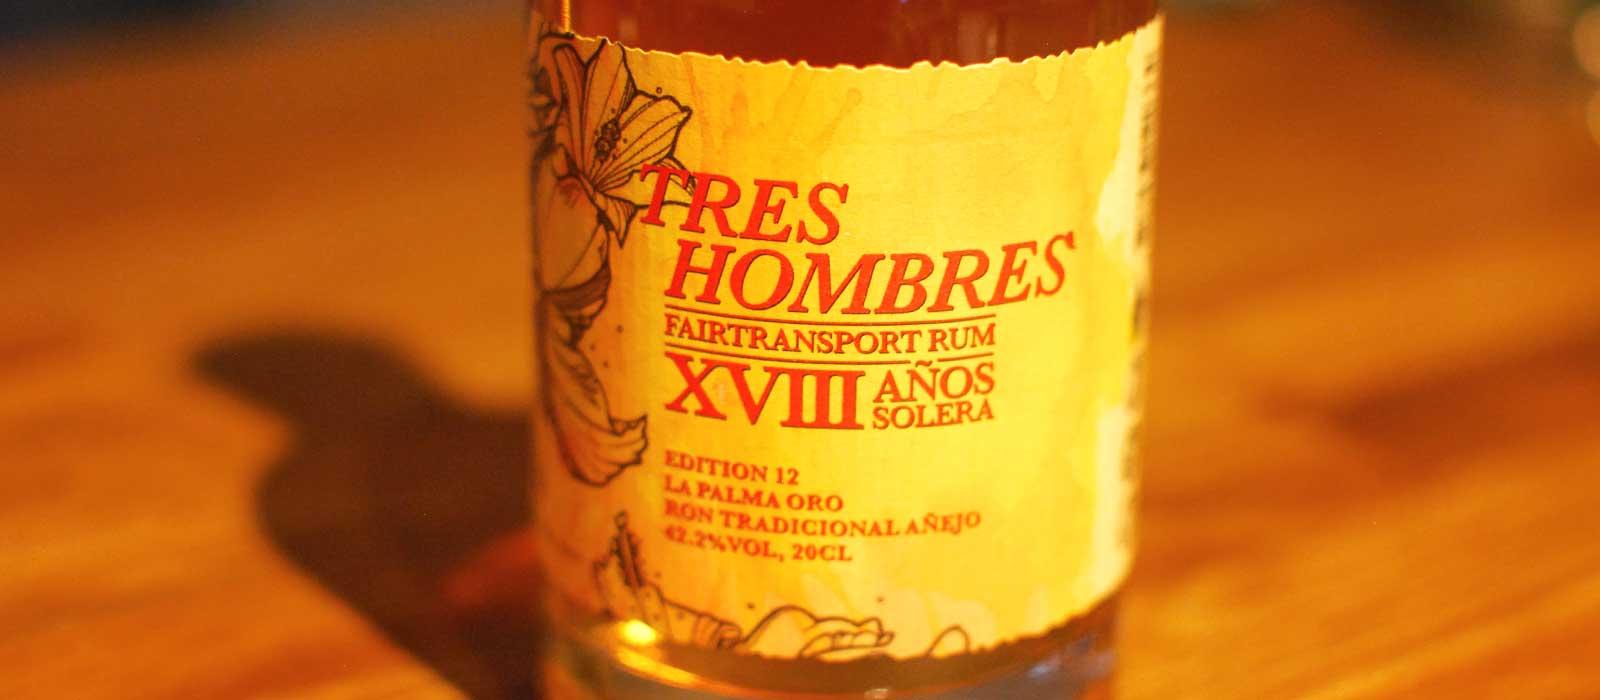 Månadens rom augusti 2016: Tres Hombres 2016 Edition 12 La Palma Oro XVIII